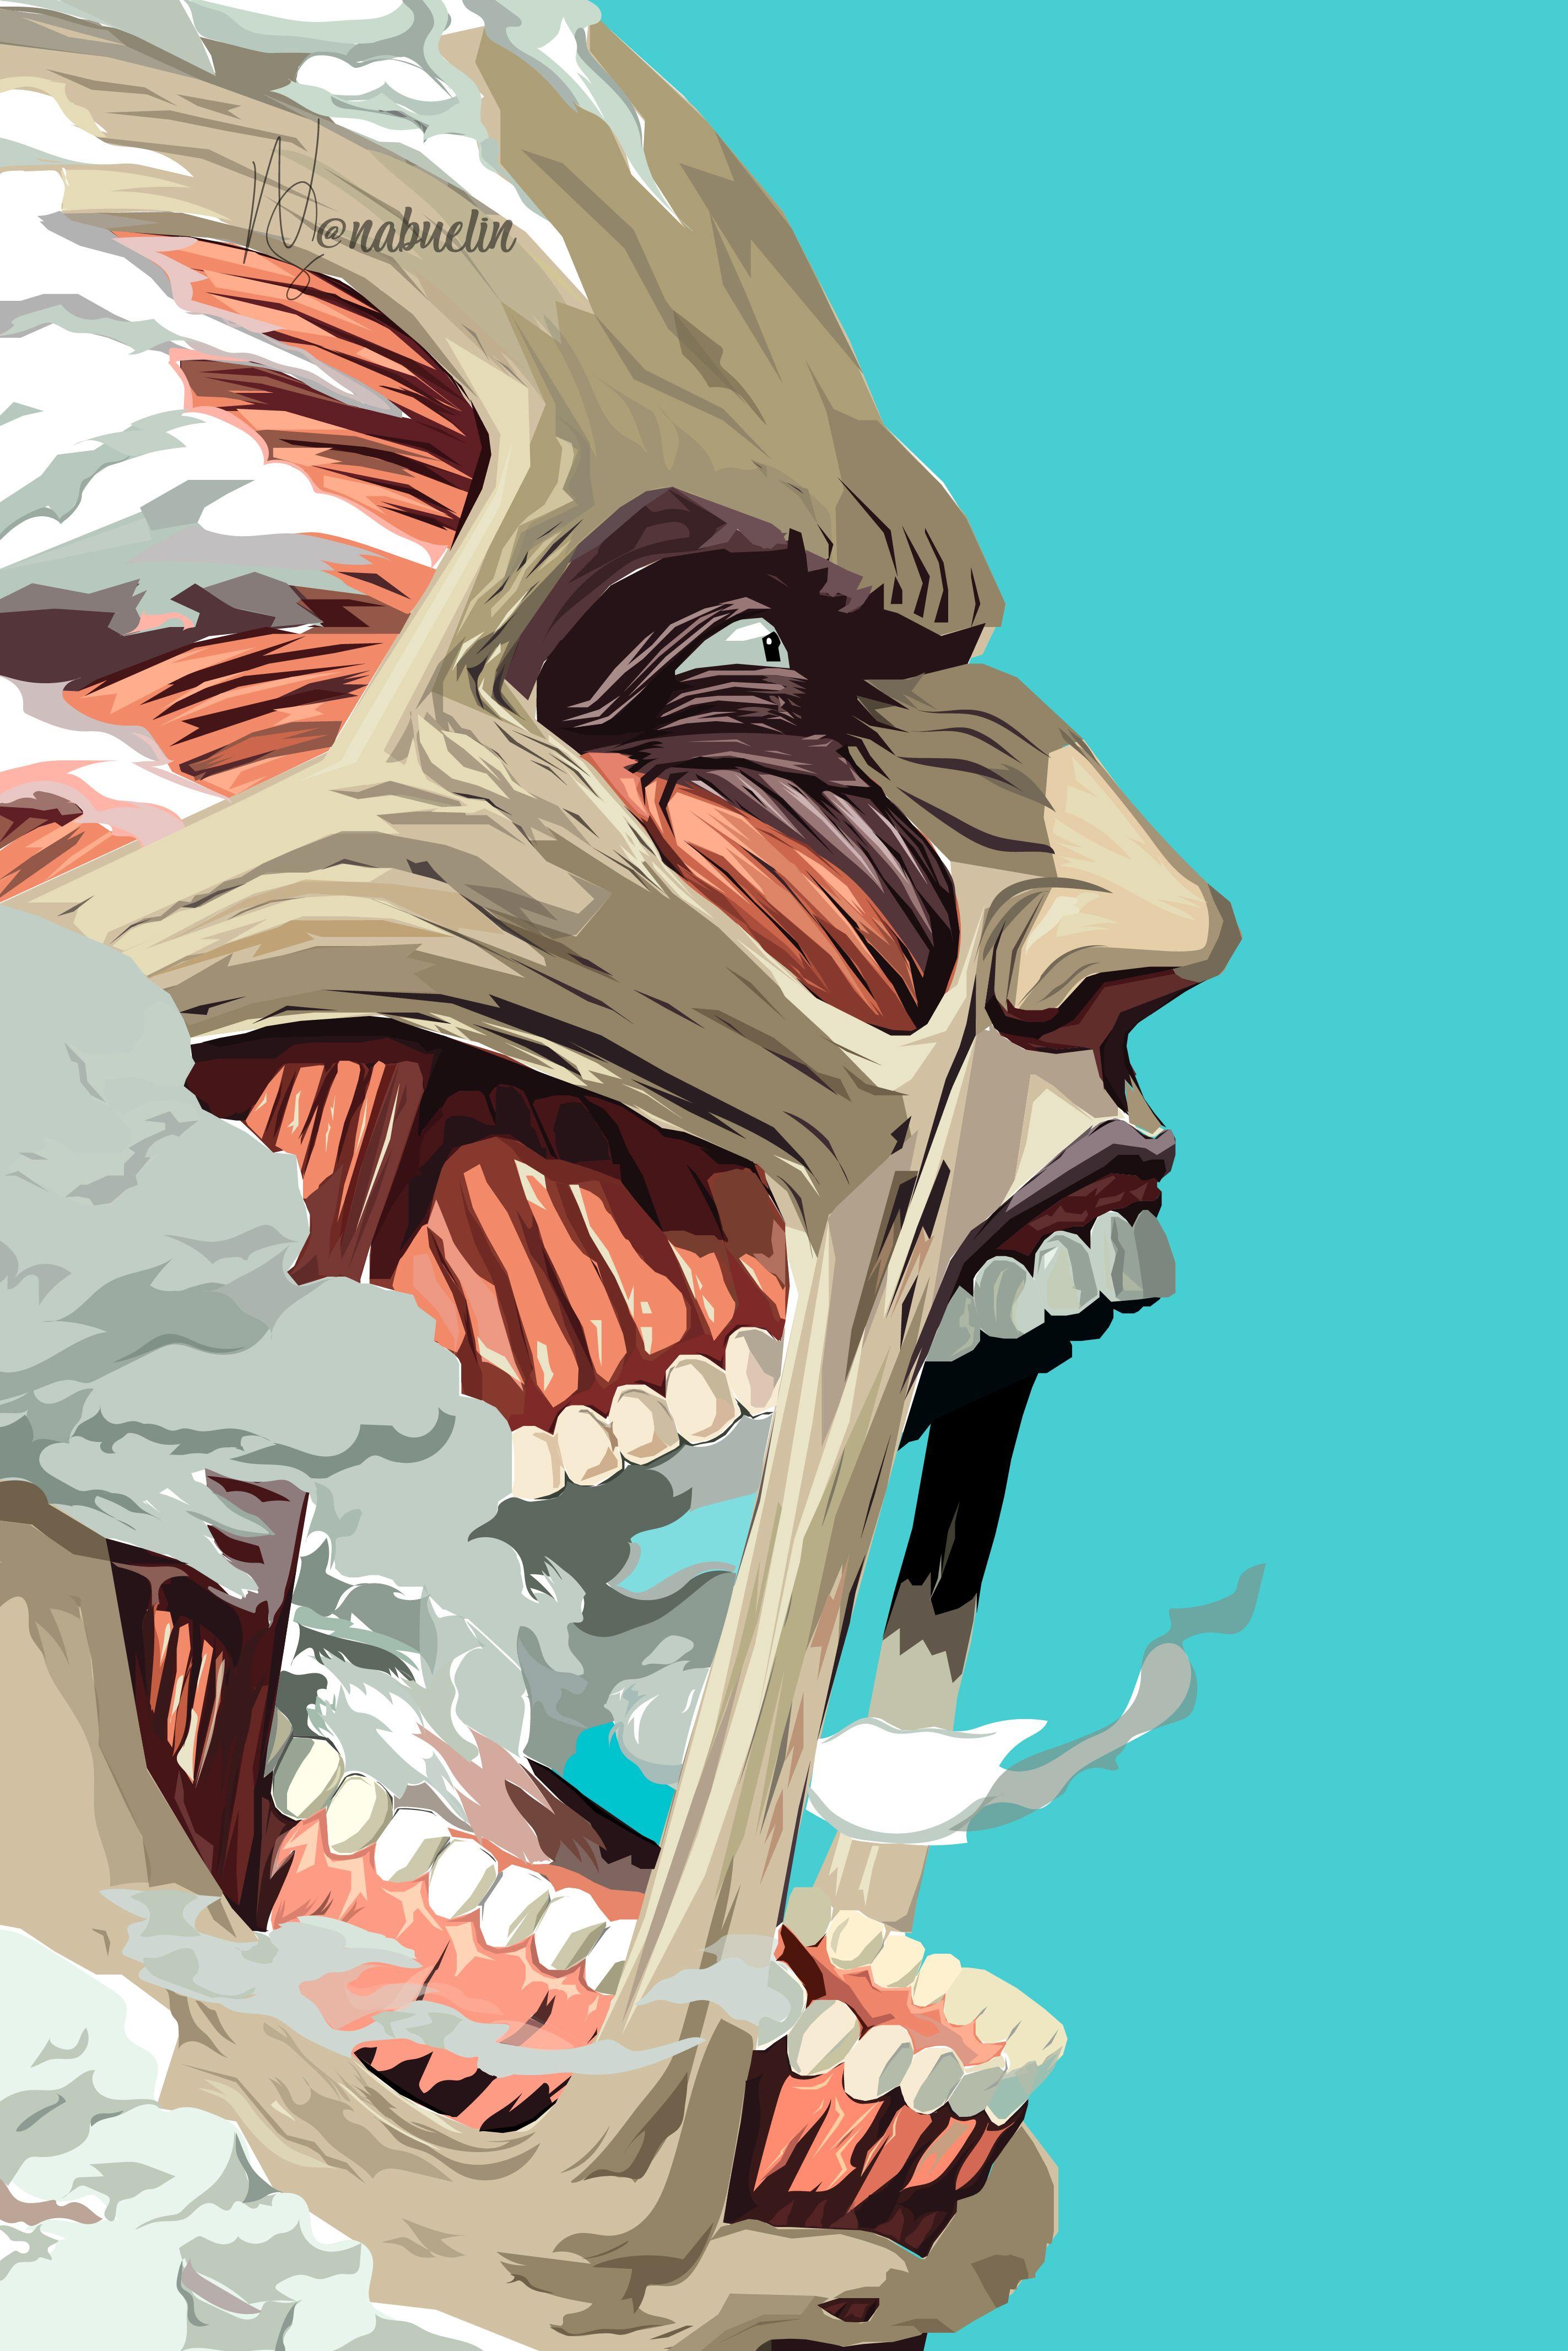 TITAN COLOSAL Shingeki No Kyojin Vector Art on Illustrator